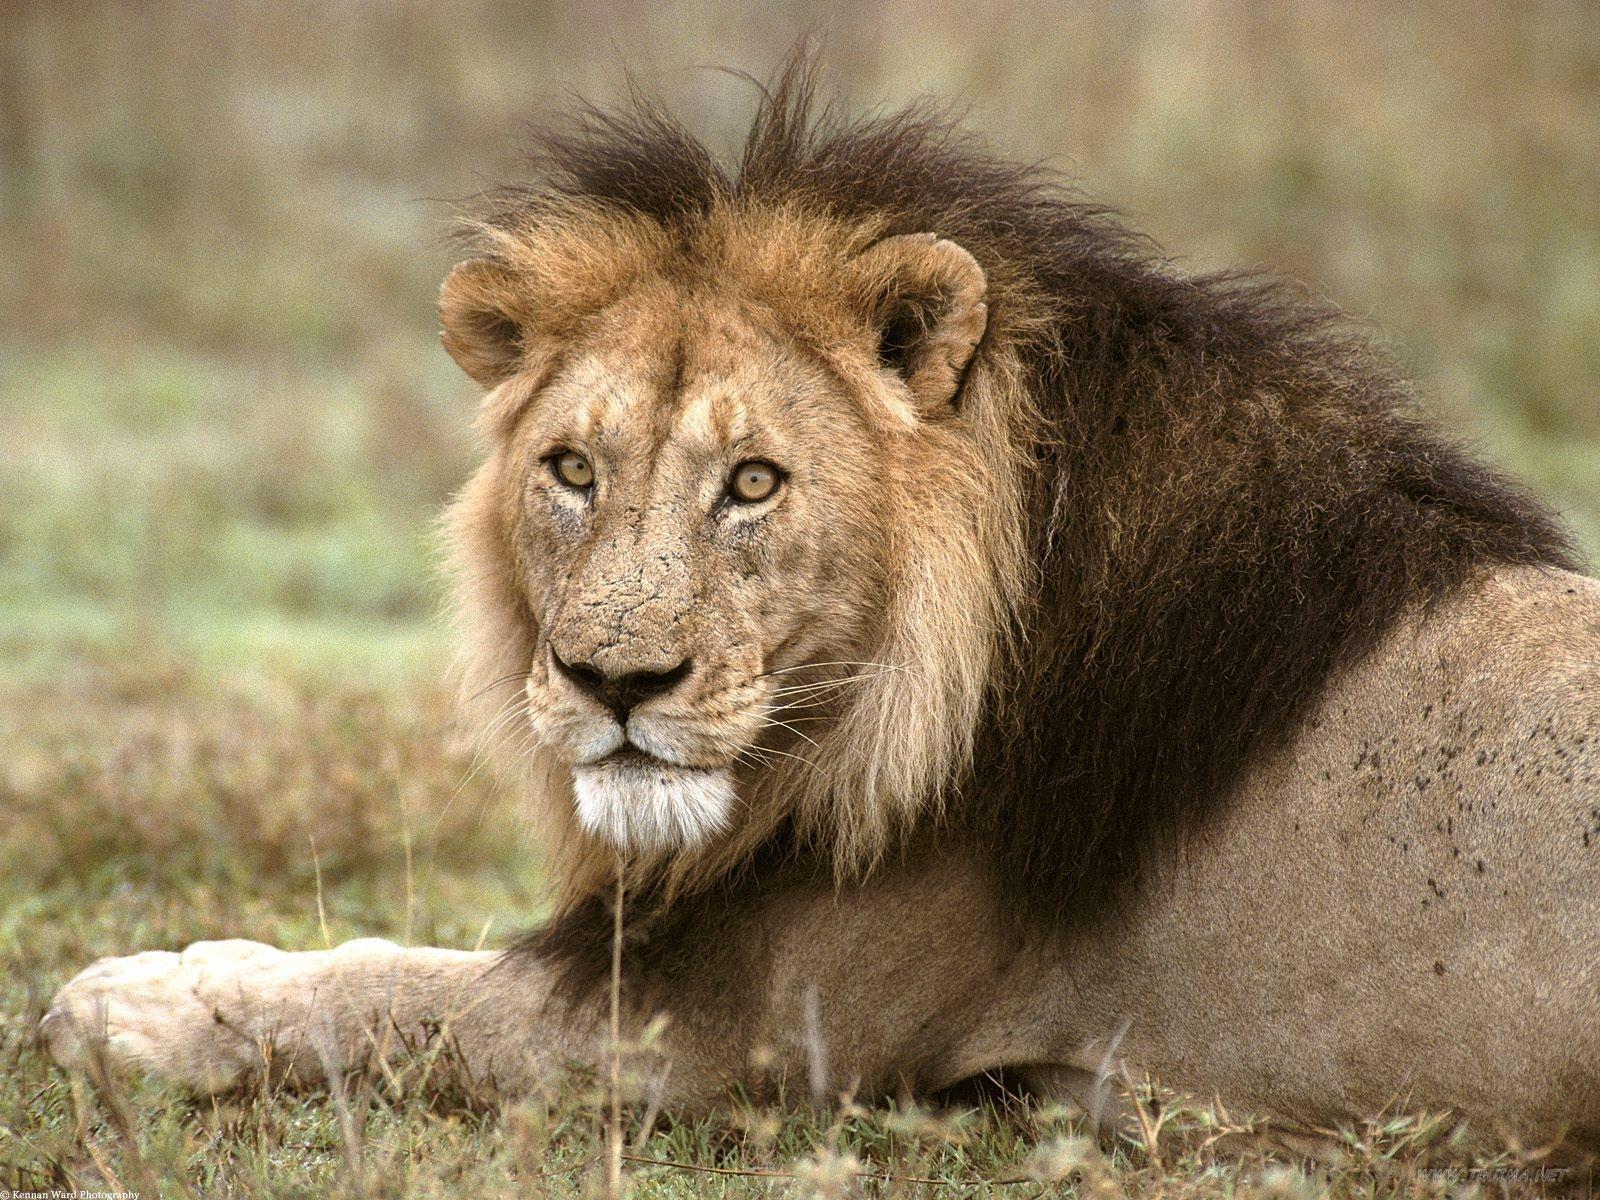 http://3.bp.blogspot.com/-bK2DwaQISIA/UMBLD2hribI/AAAAAAAACnY/fX2UBQ6YvvQ/s1600/Lion+Pictures+1.jpg